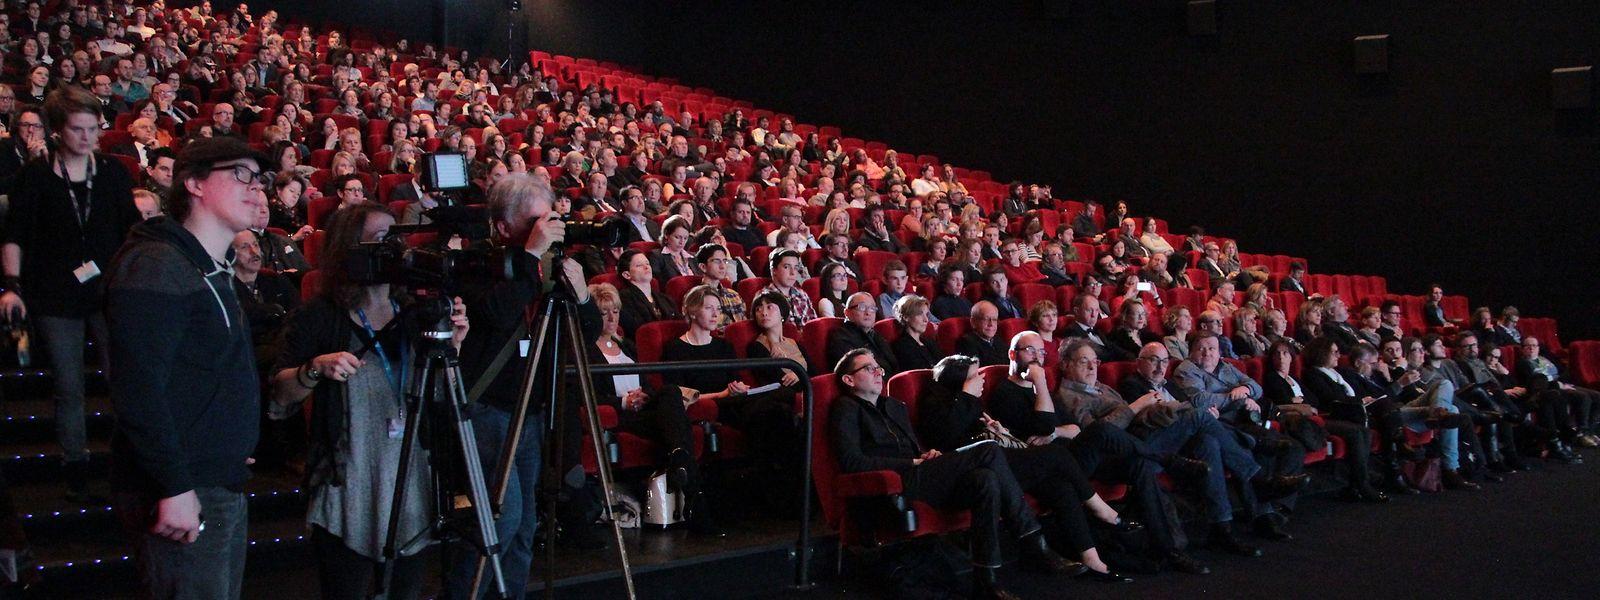 25.02.2016 Luxembourg, Kirchberg, Kino, Utopolis, ouverture City Film Festival  photo Anouk Antony